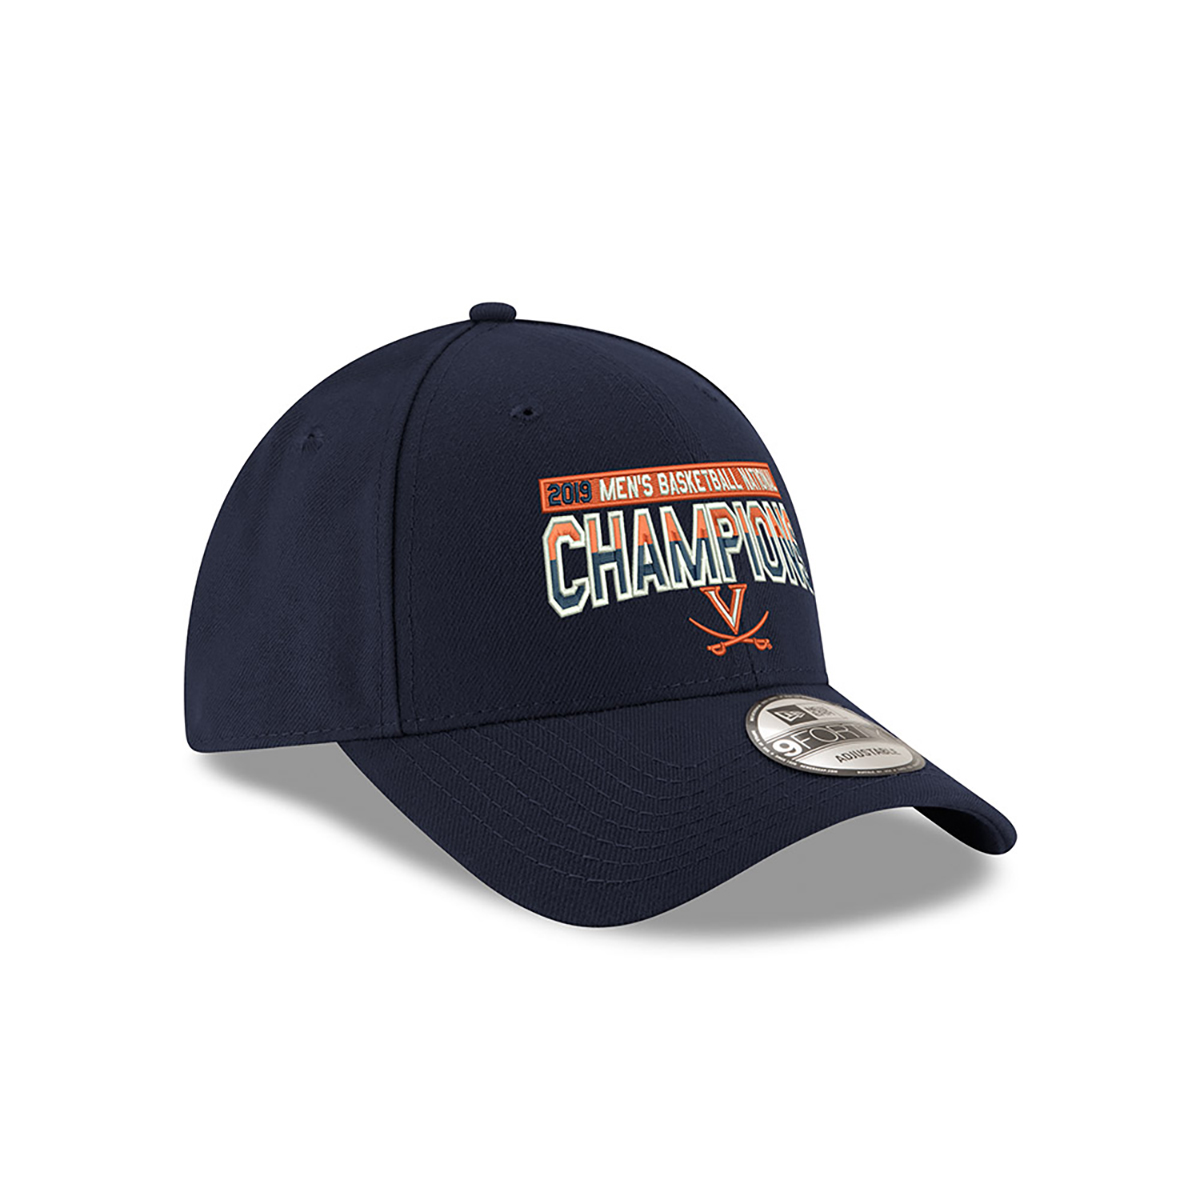 2019 National Champions New Era 9TWENTY Hat